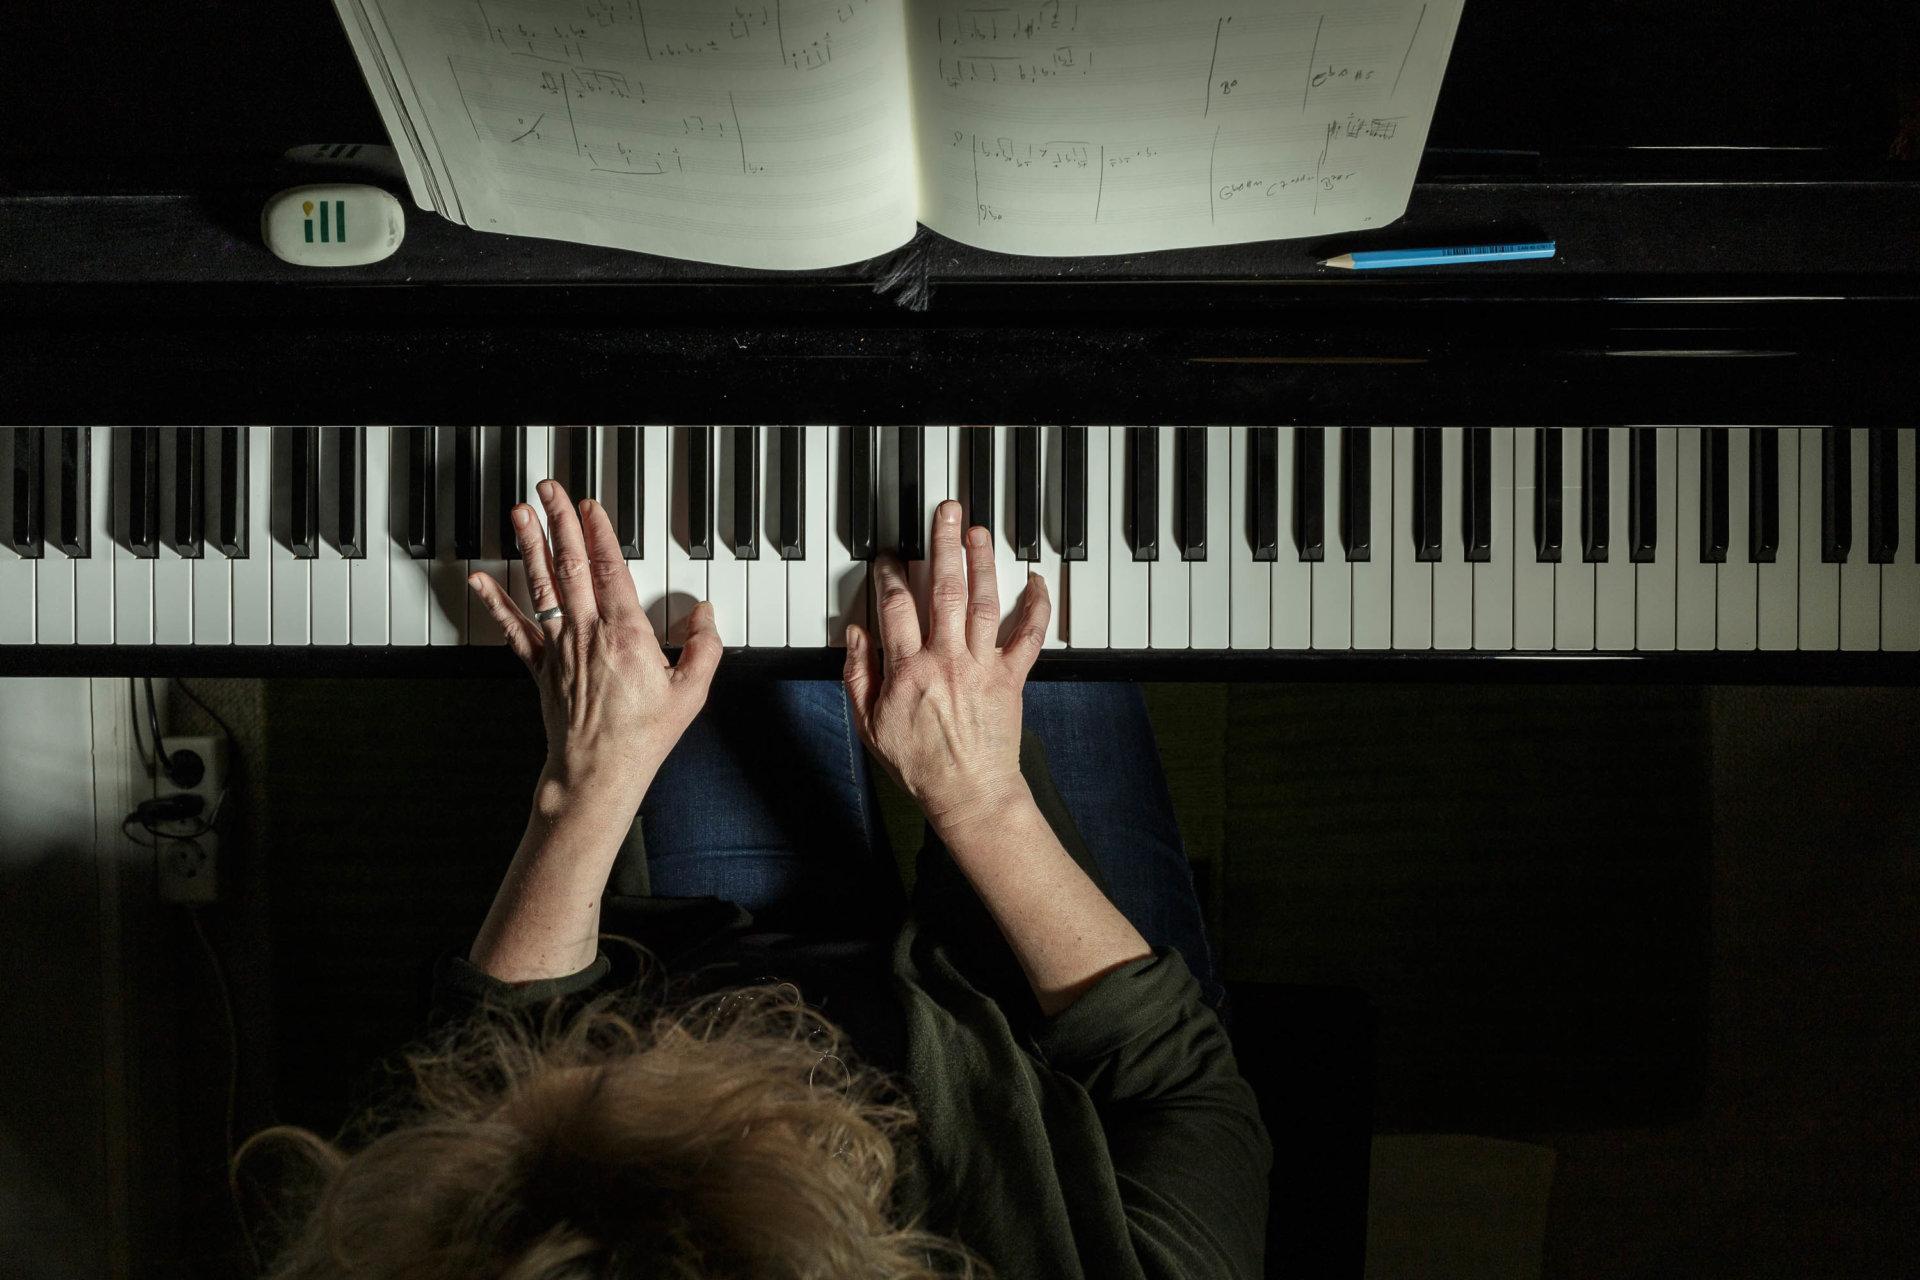 Flügel, Julia Hülsmann, Pianistin, Yamaha, meisterfinger, tasten